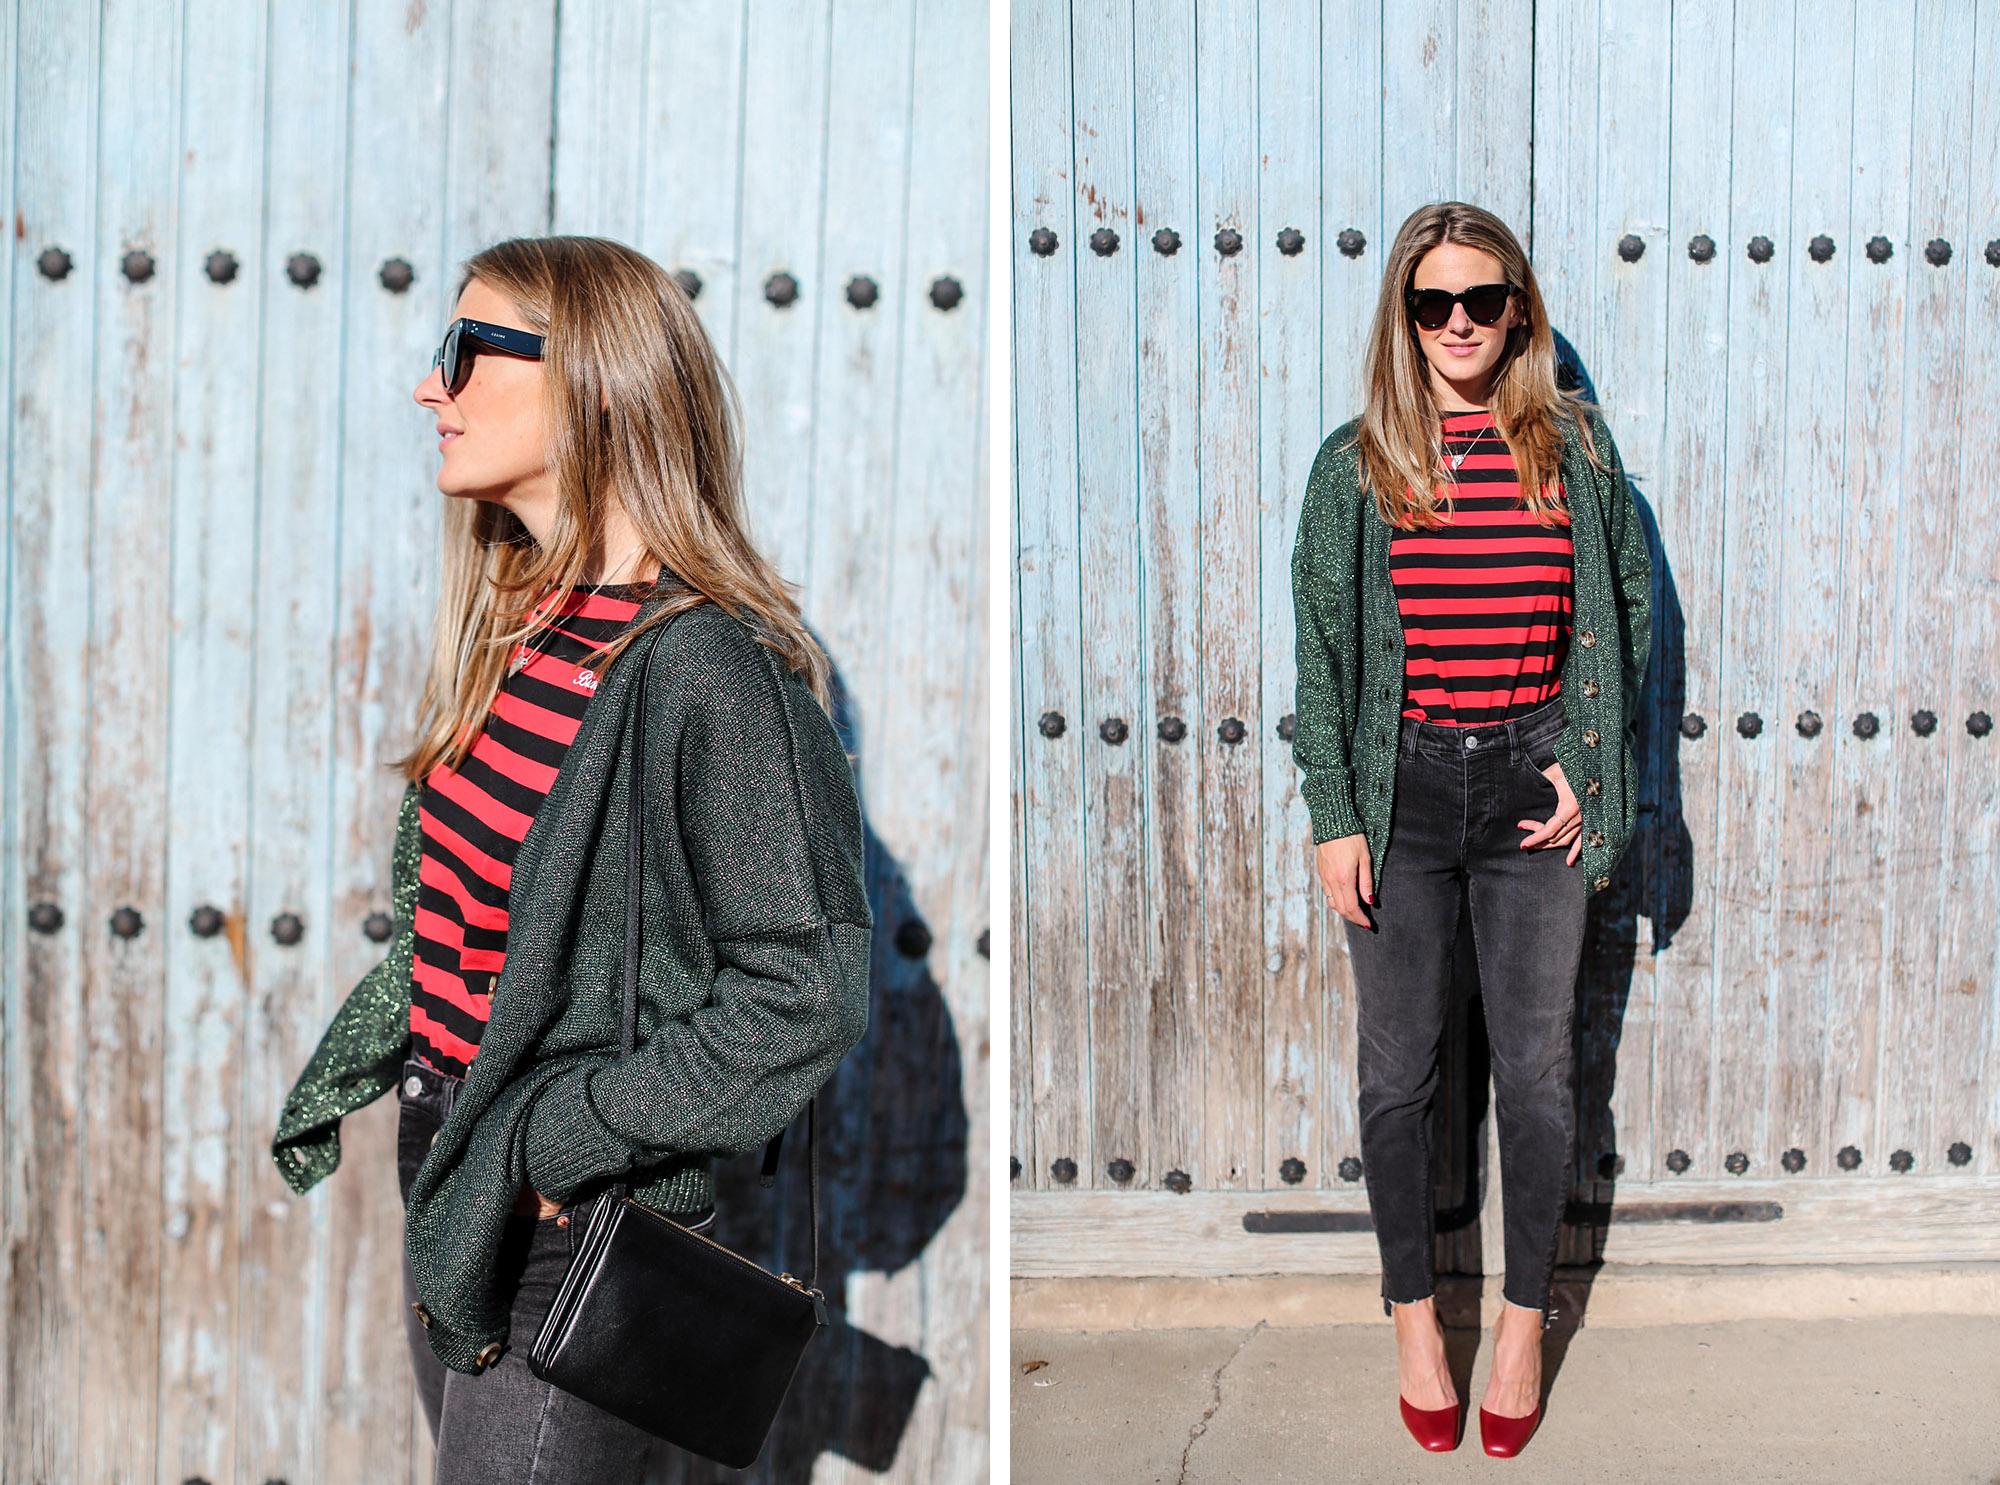 clochet_streetstyle_fashionblogger_zapatostaconrojospielzara_bolsotrioceline_momjeansh&m-10